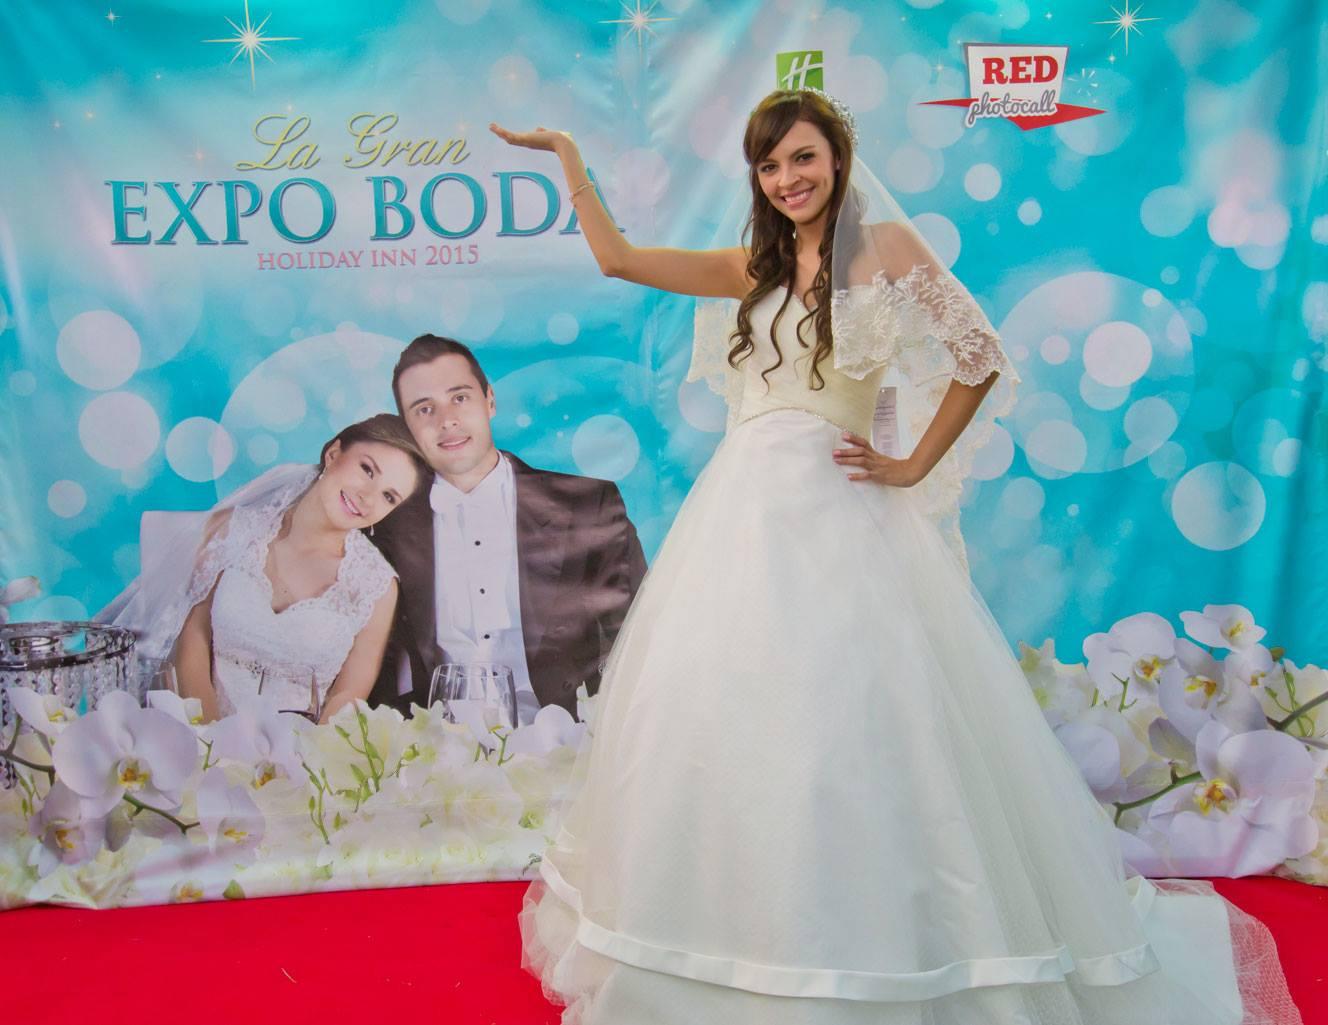 Expo Boda HI2015